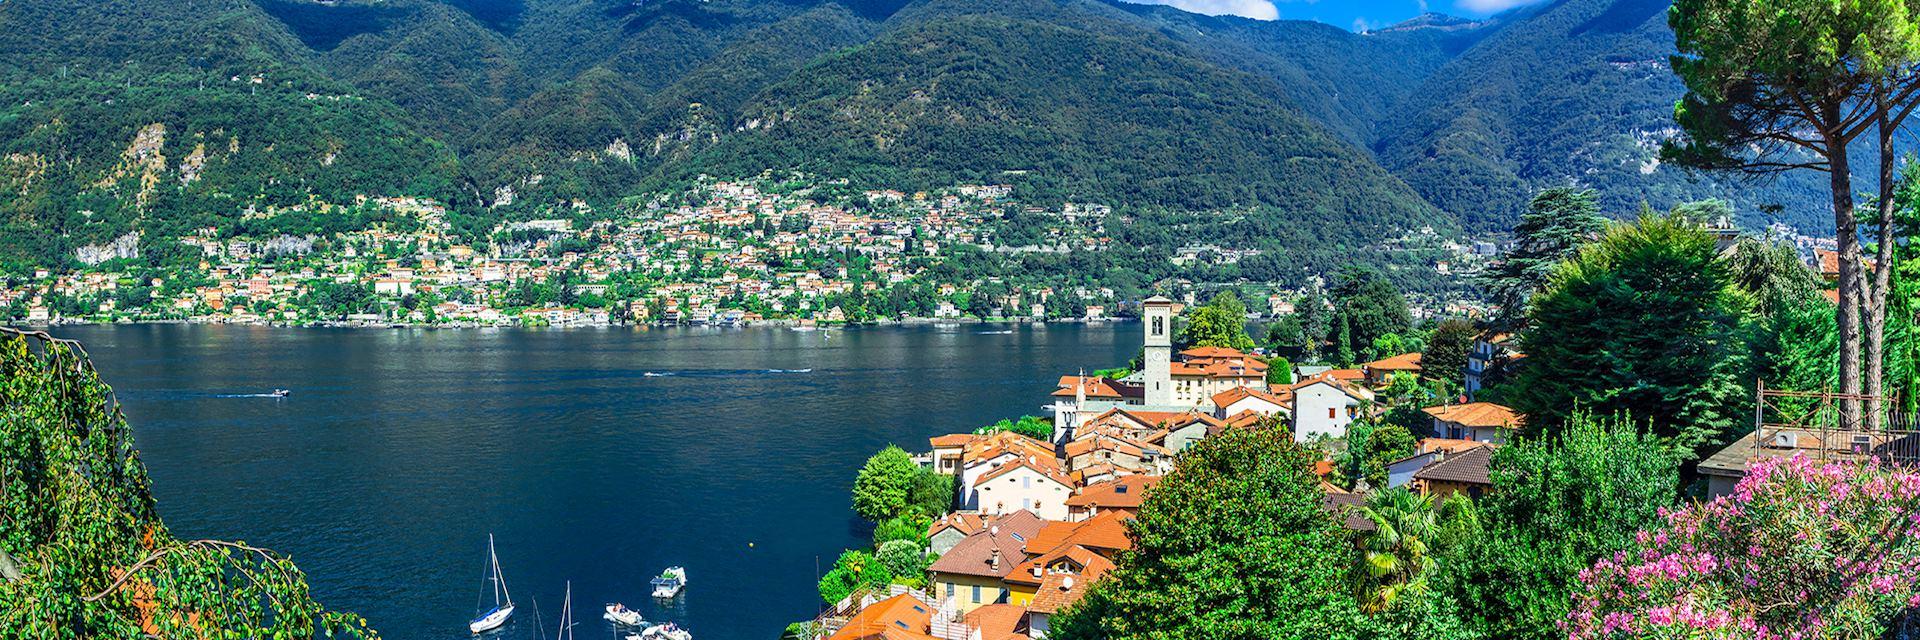 Blevio, Italy